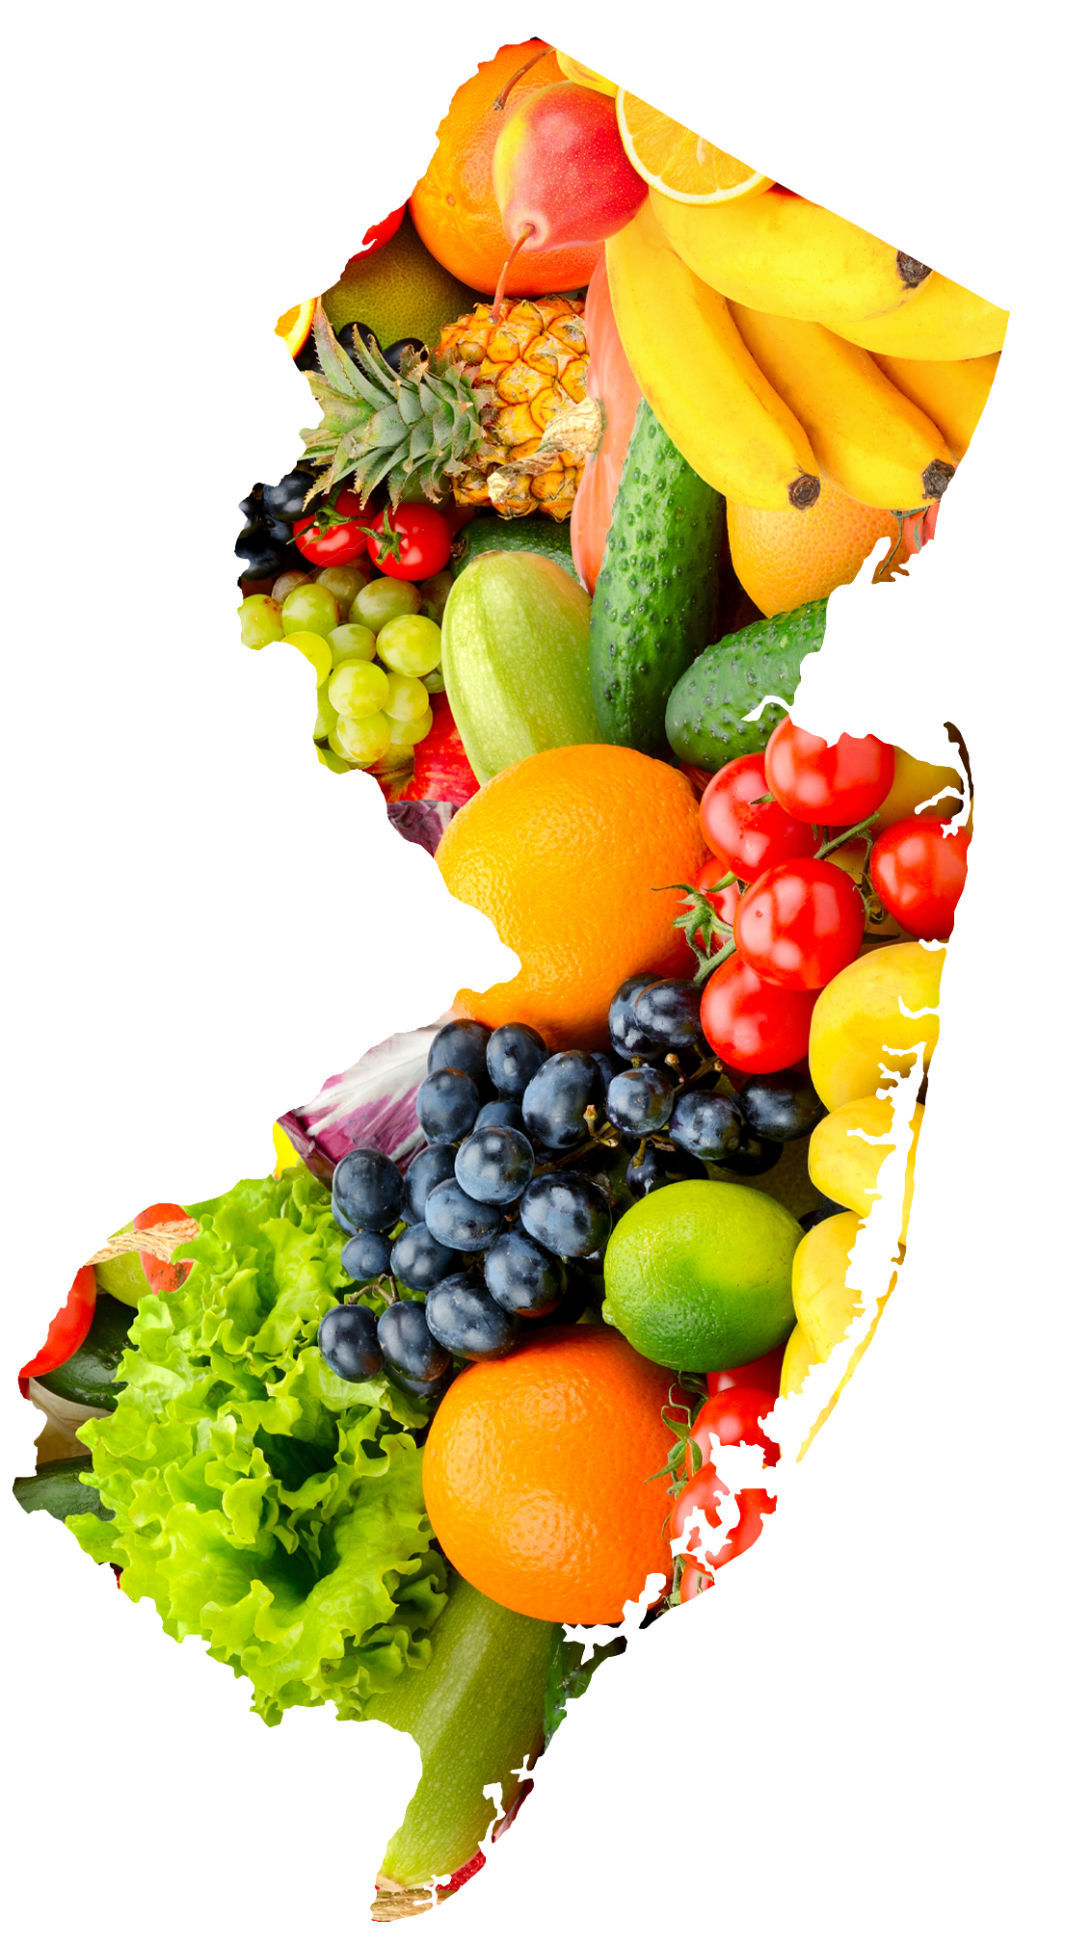 New Jersey produce